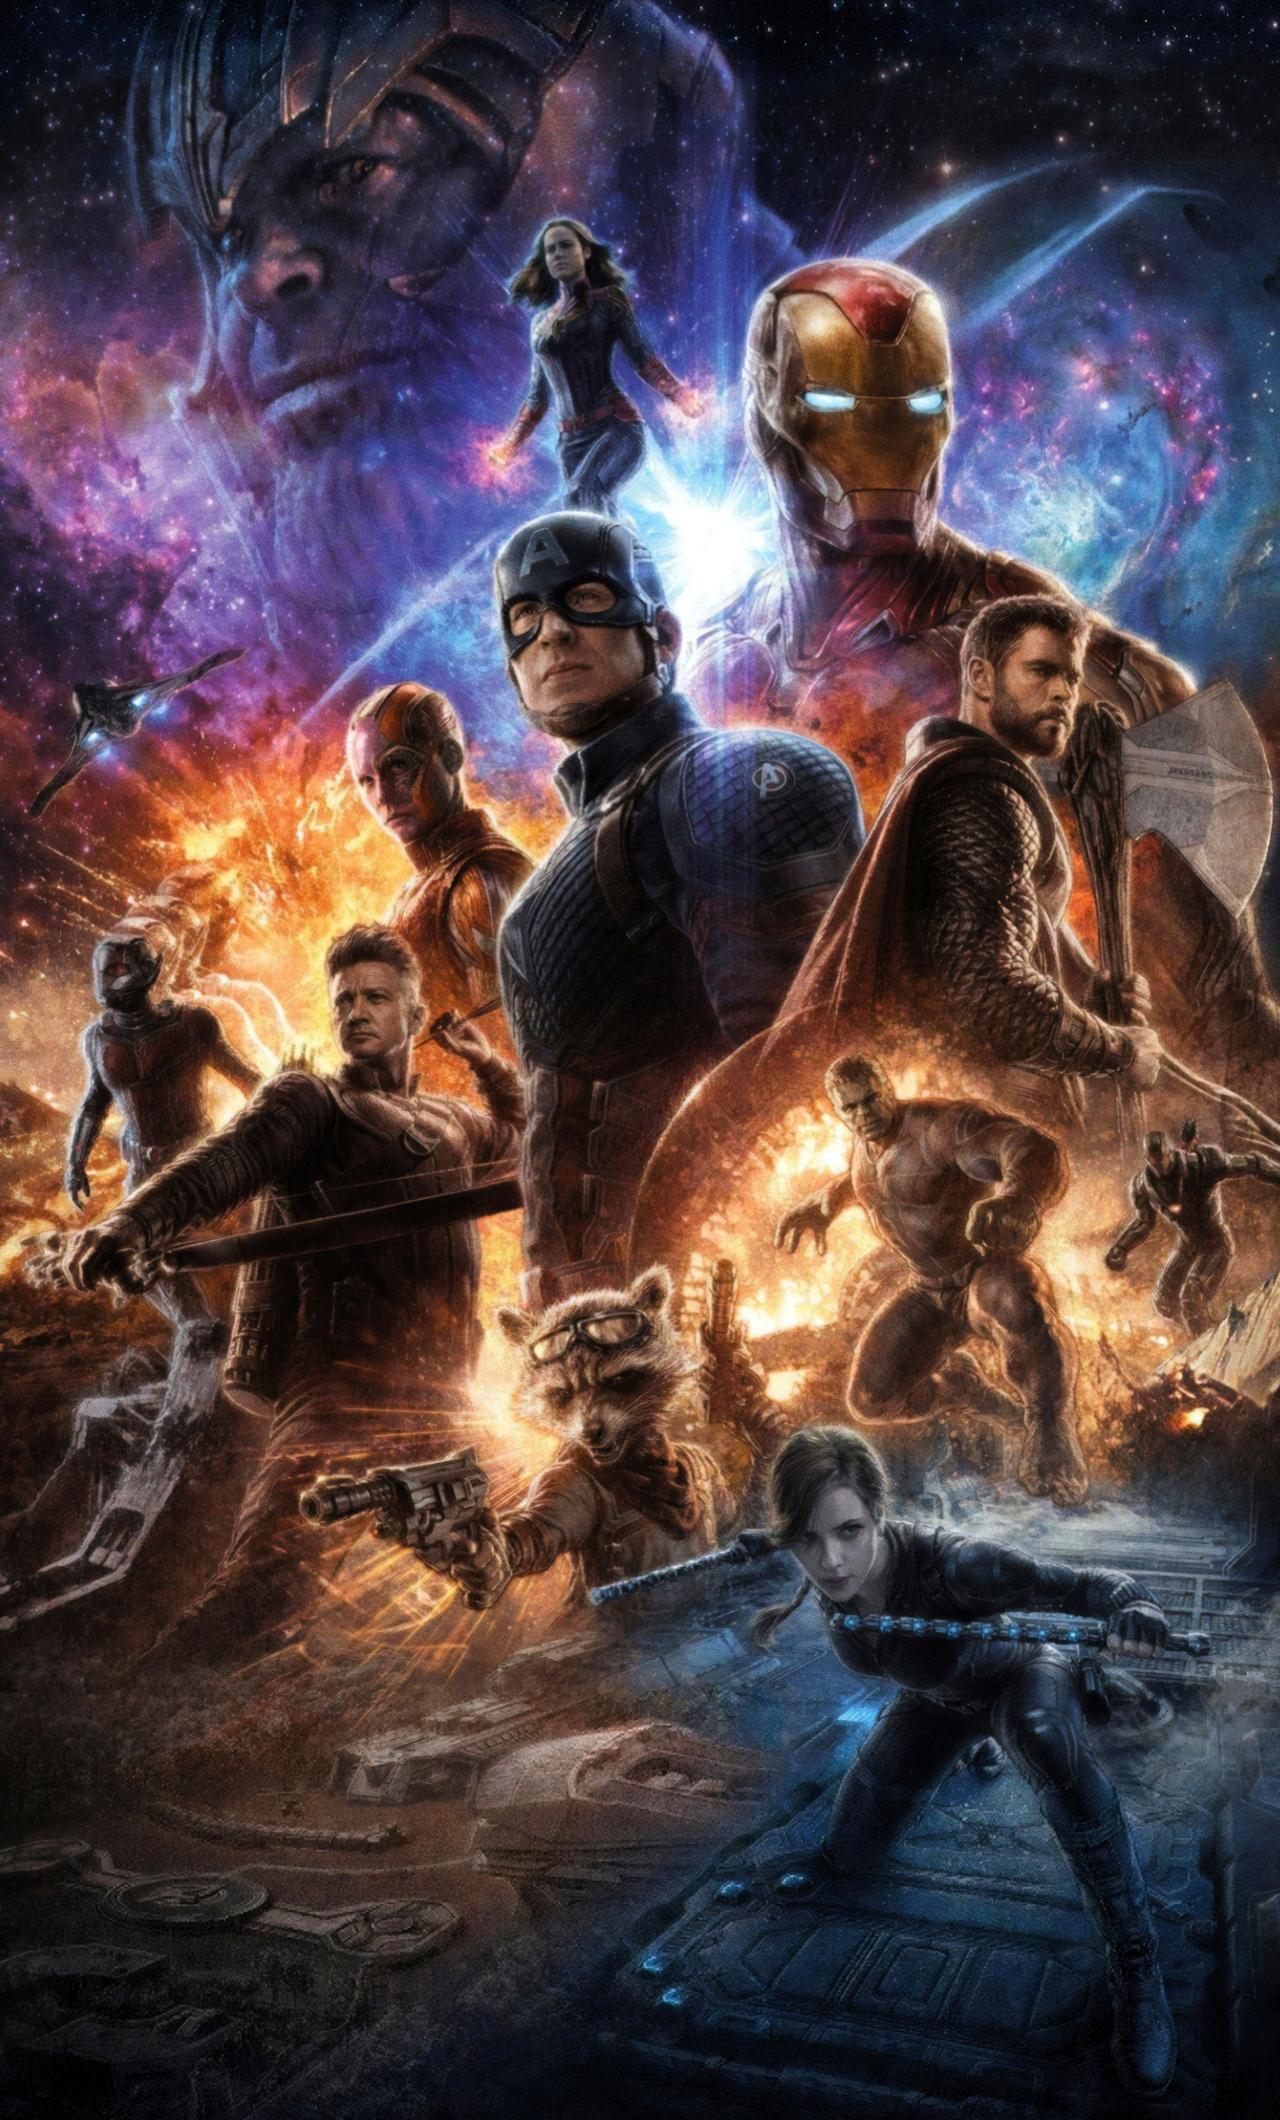 1280x2120 4k Avengers Endgame iPhone 6+ HD 4k Wallpapers ...